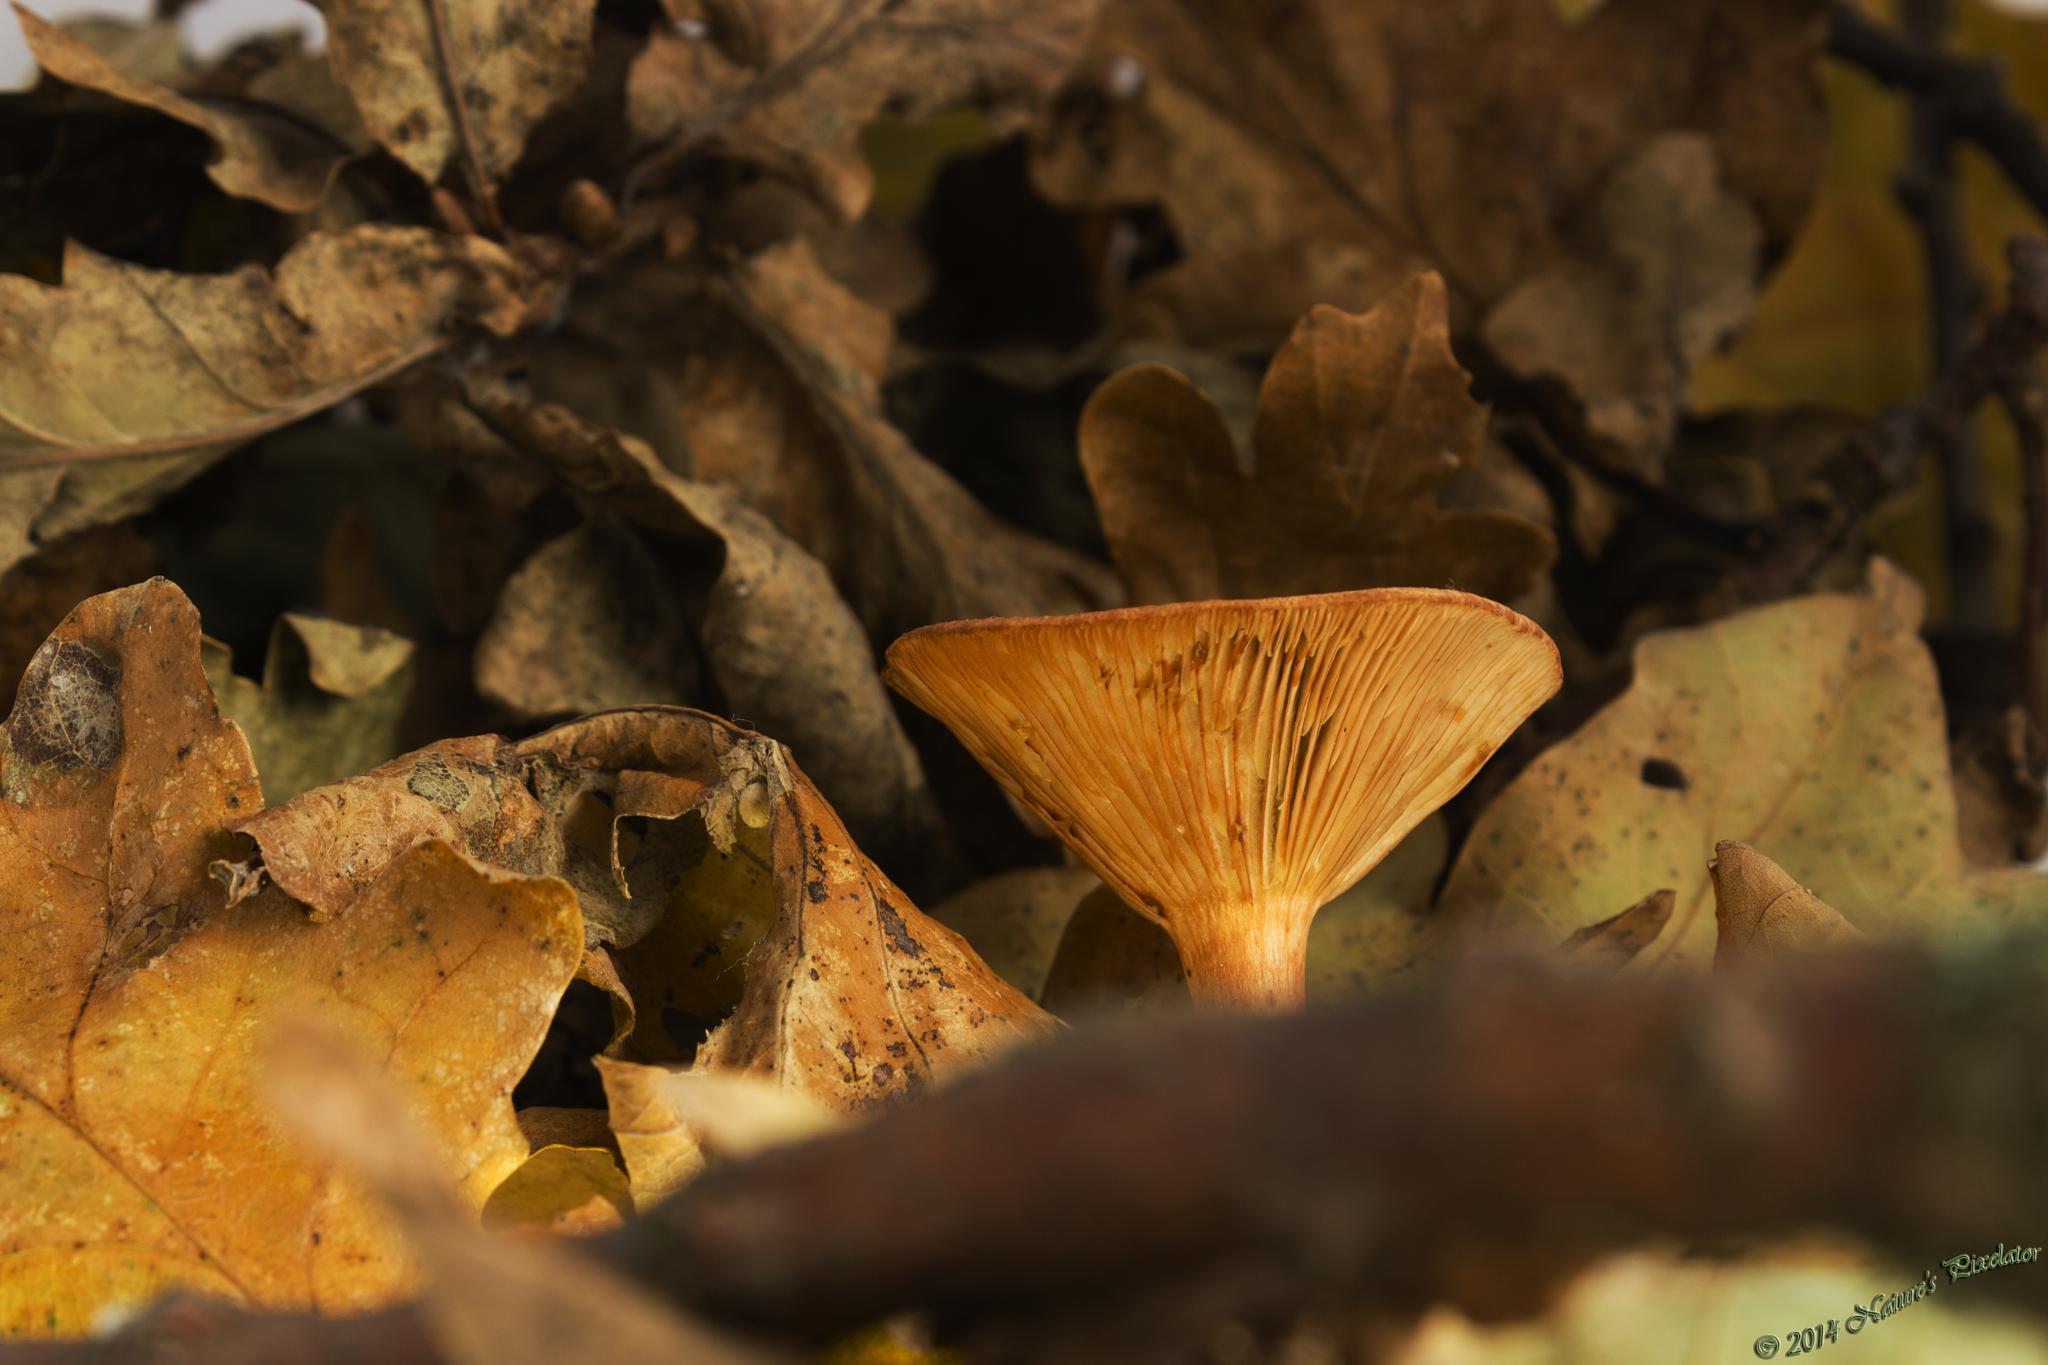 Mushroom or Bongo Drum ? by Nature's Pixelator